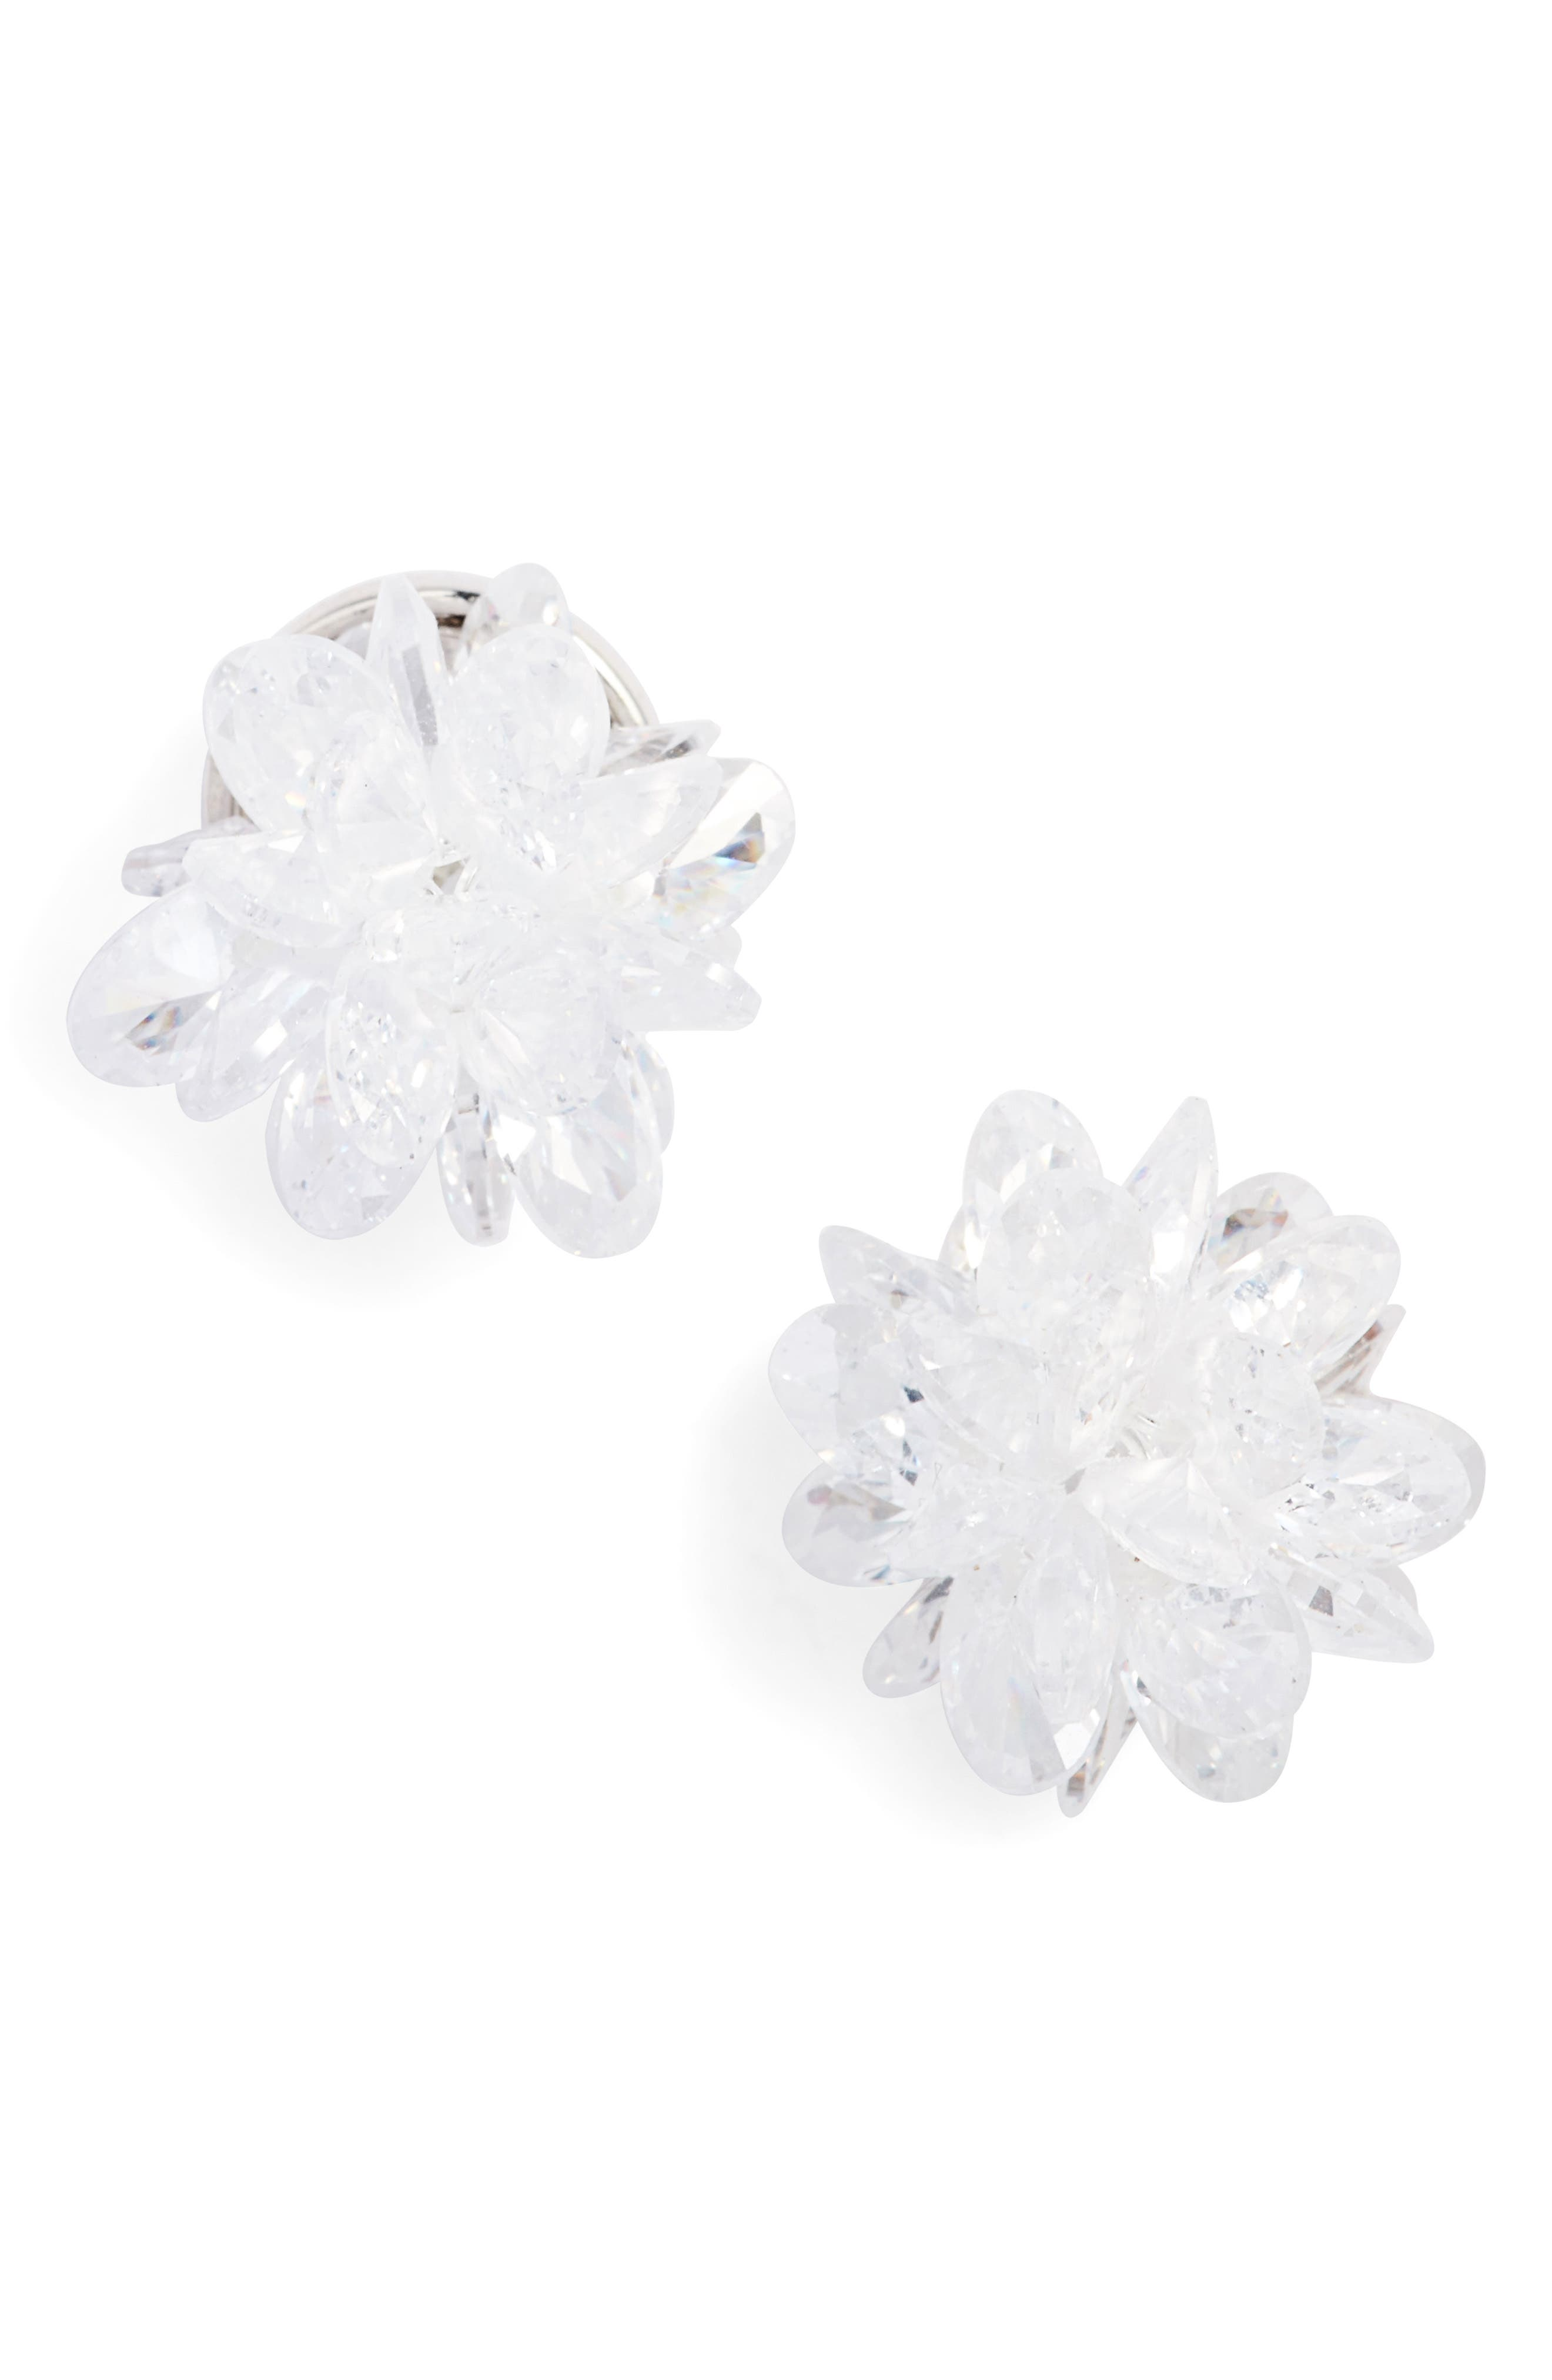 Alternate Image 1 Selected - kate spade new york flying colors rock candy stud earrings